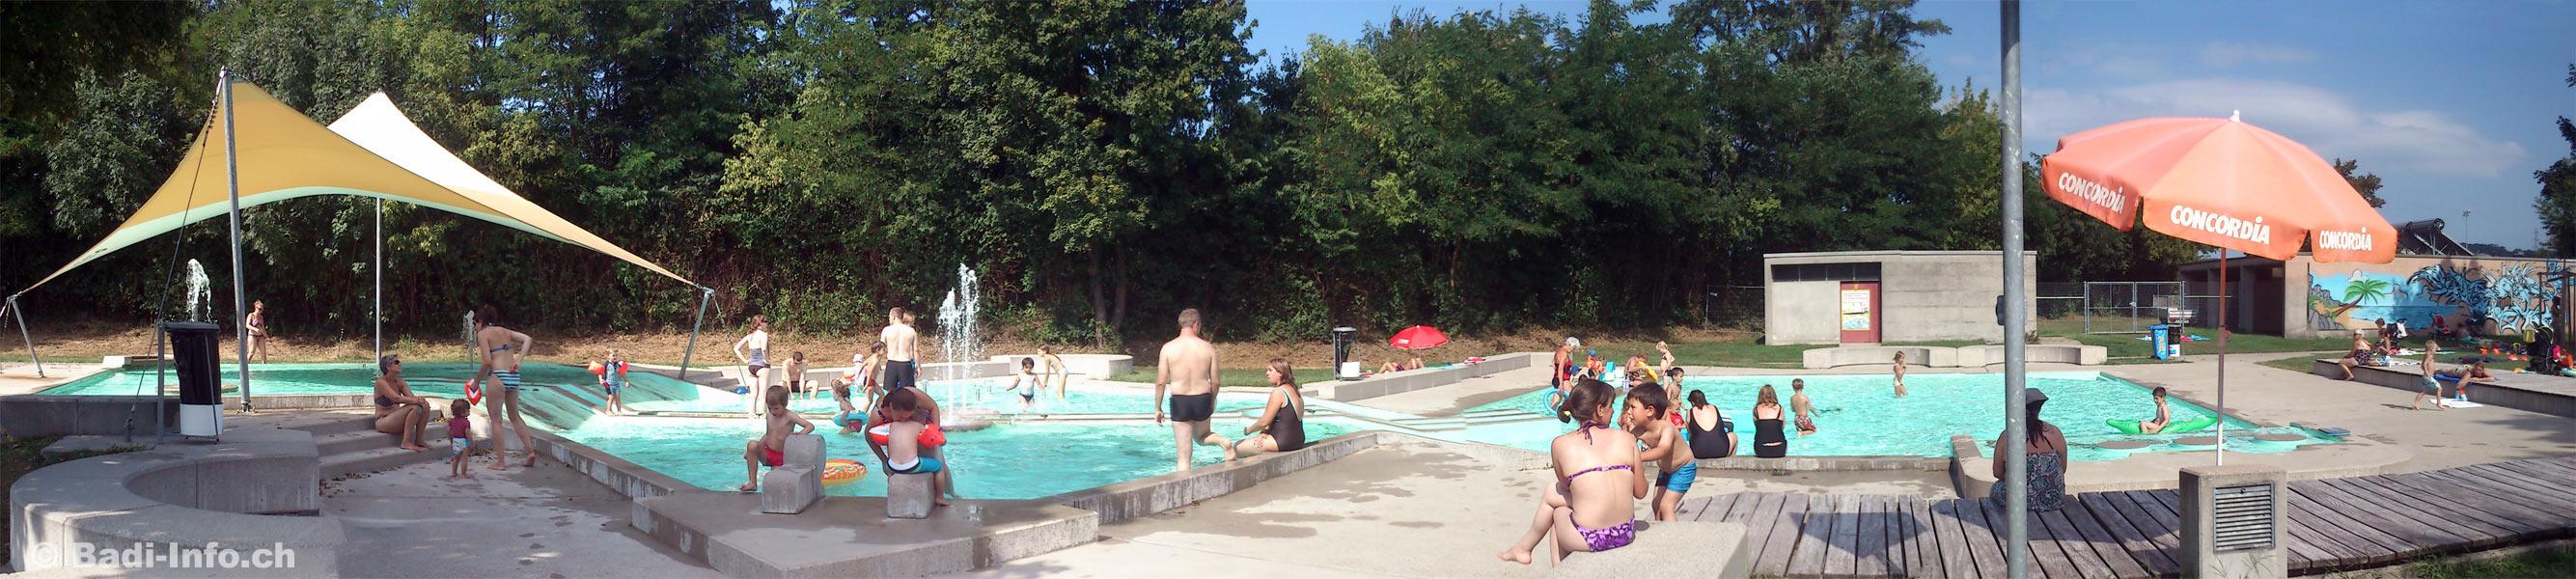 Kinderbad Schwimmbad Pratteln